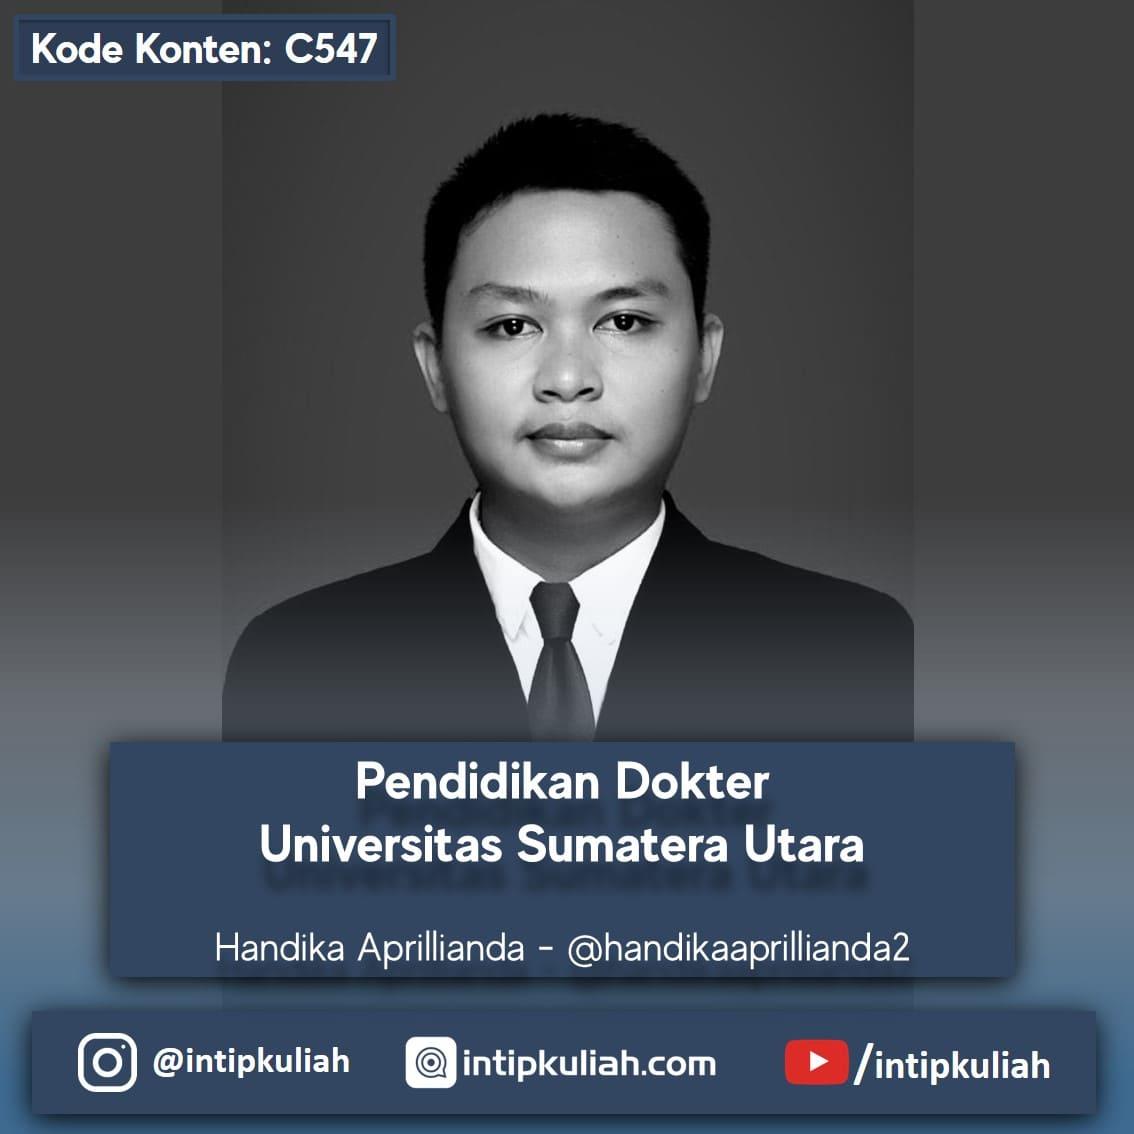 Pendidikan Dokter Universitas Sumatera Utara (Handika)